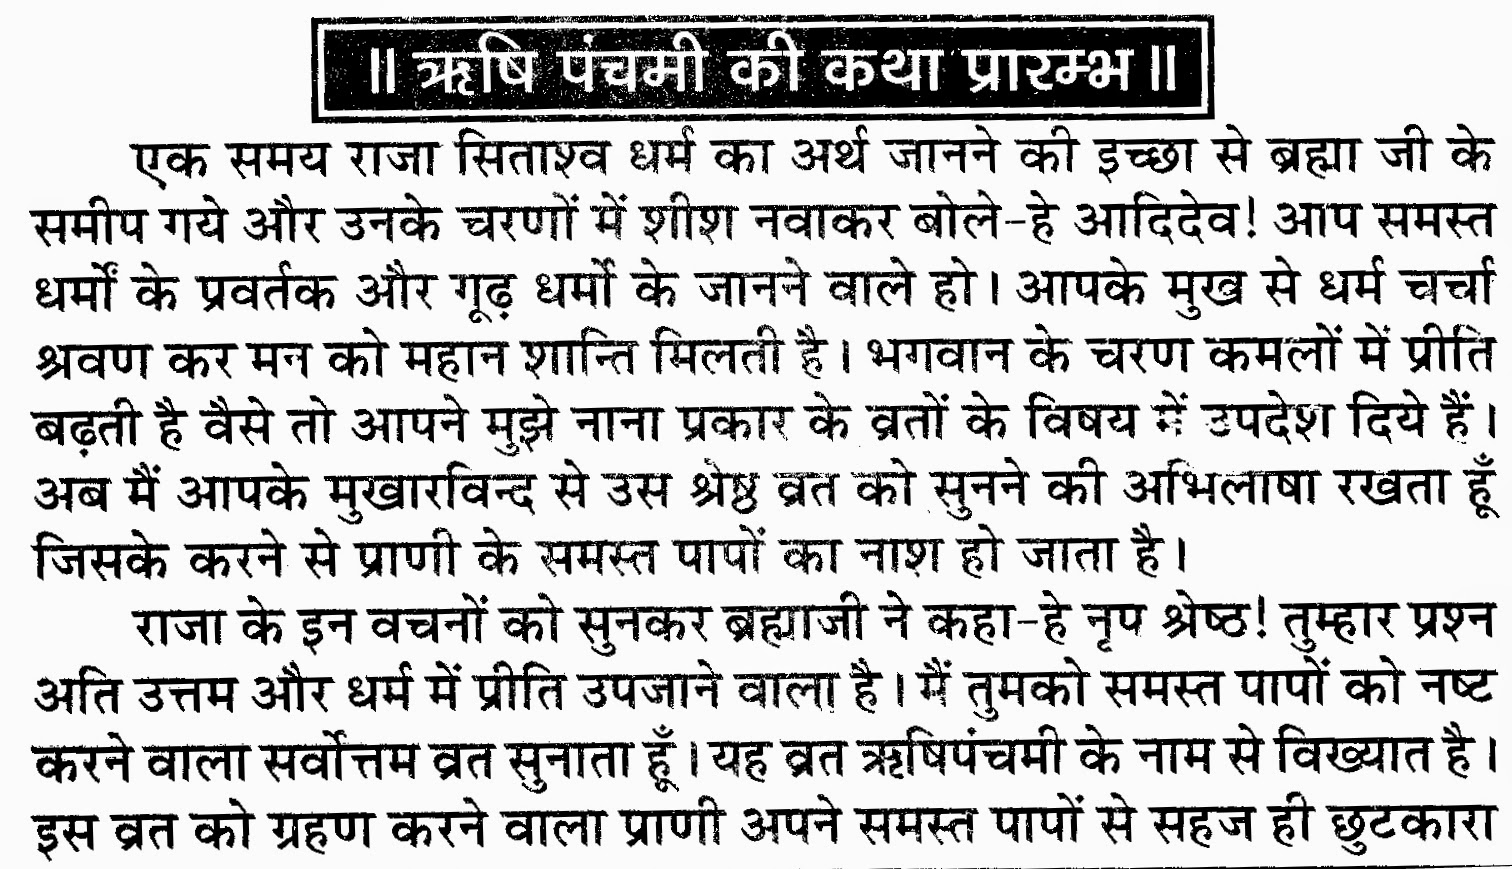 Essay on team spirit in hindi